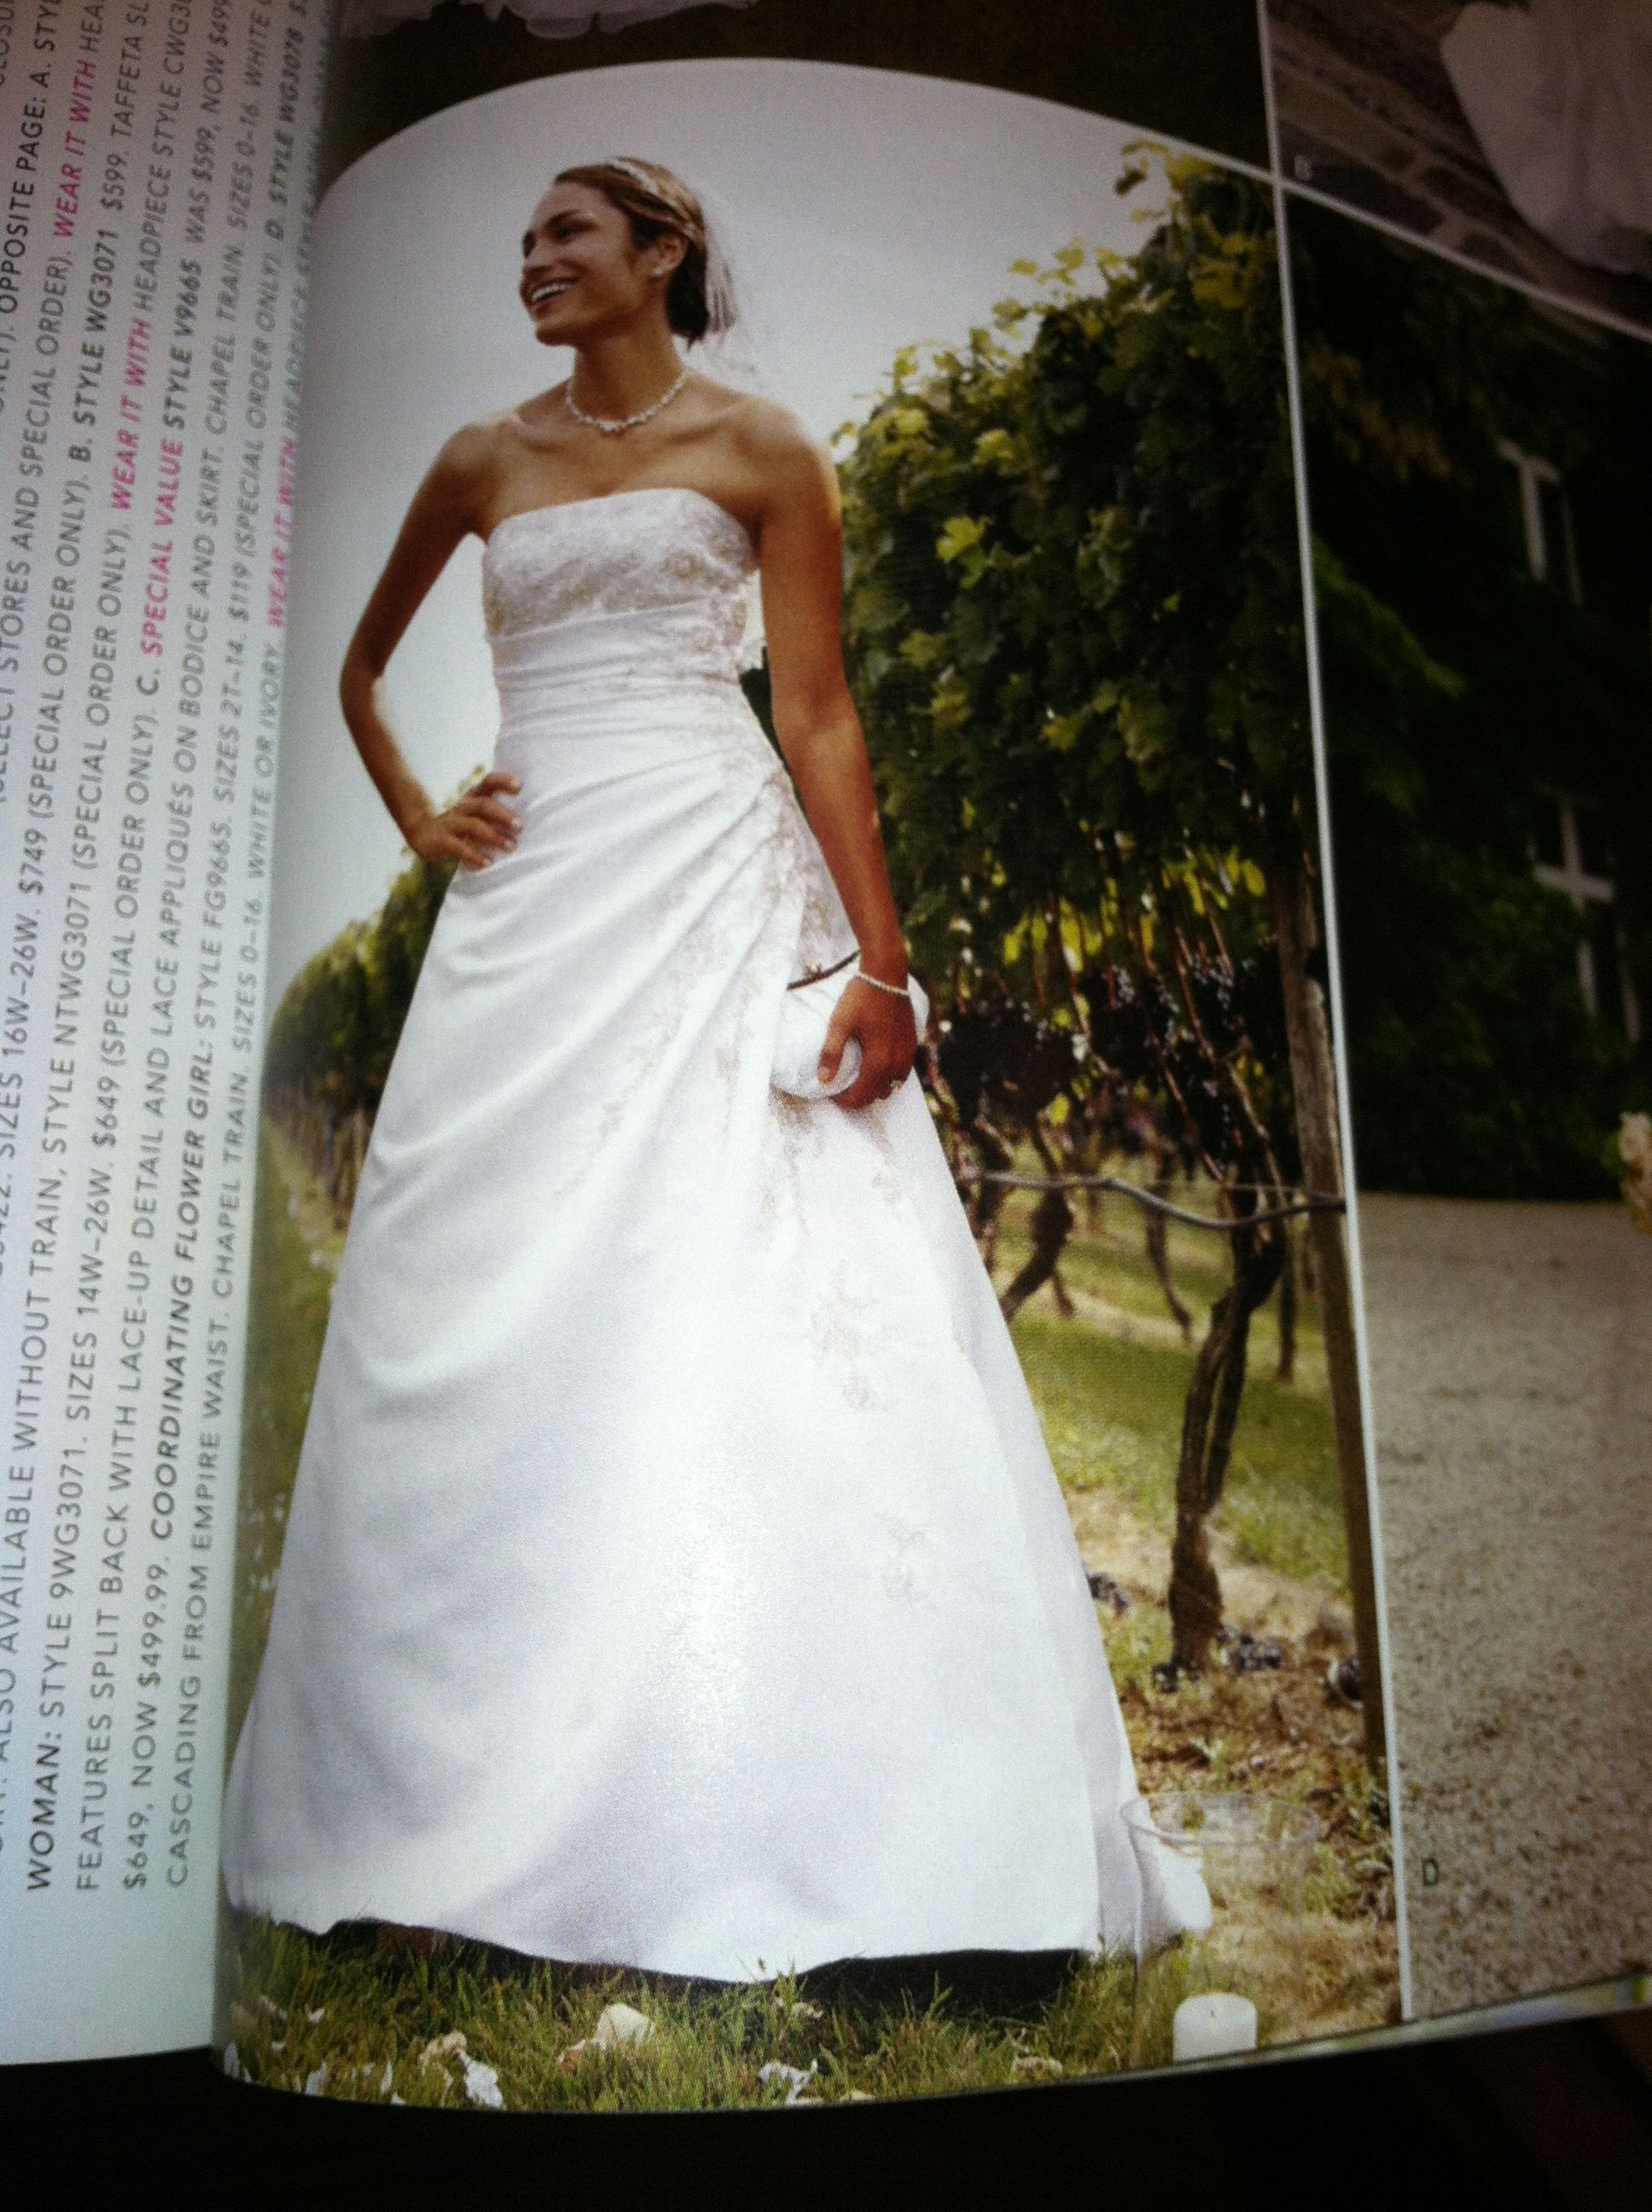 My wedding dress love it :-)